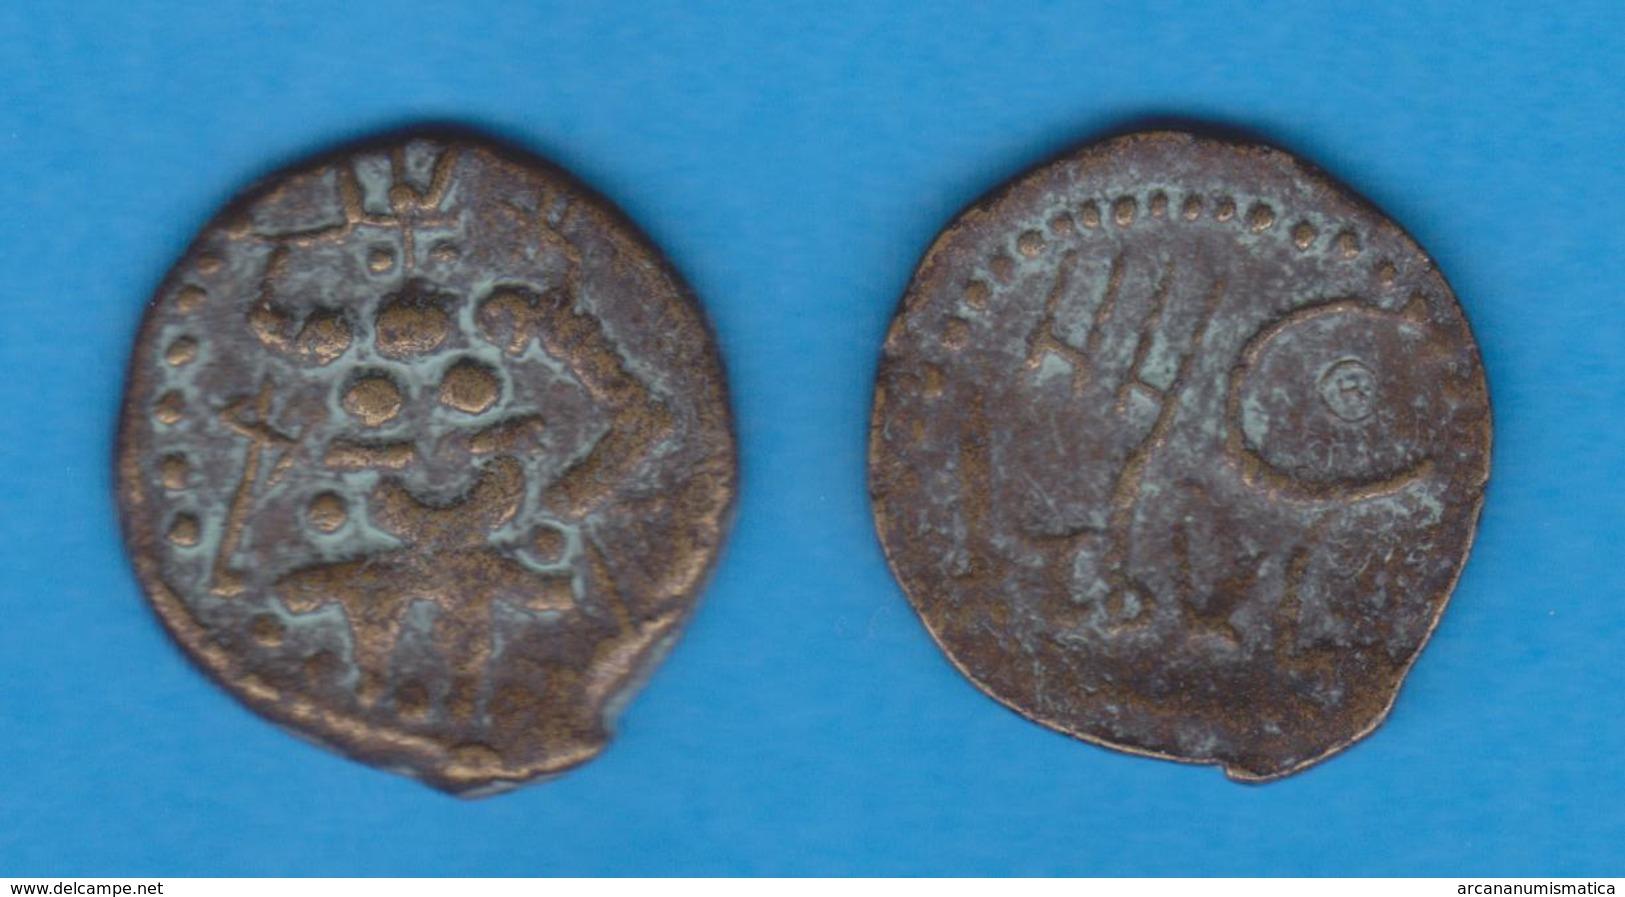 COLONIA FENICIA SEMIS BRONCE YBSM Ebusim Fines Del Siglo II A.C. Replica Réplica  SC/UNC    DL-11.995 - Antiguas